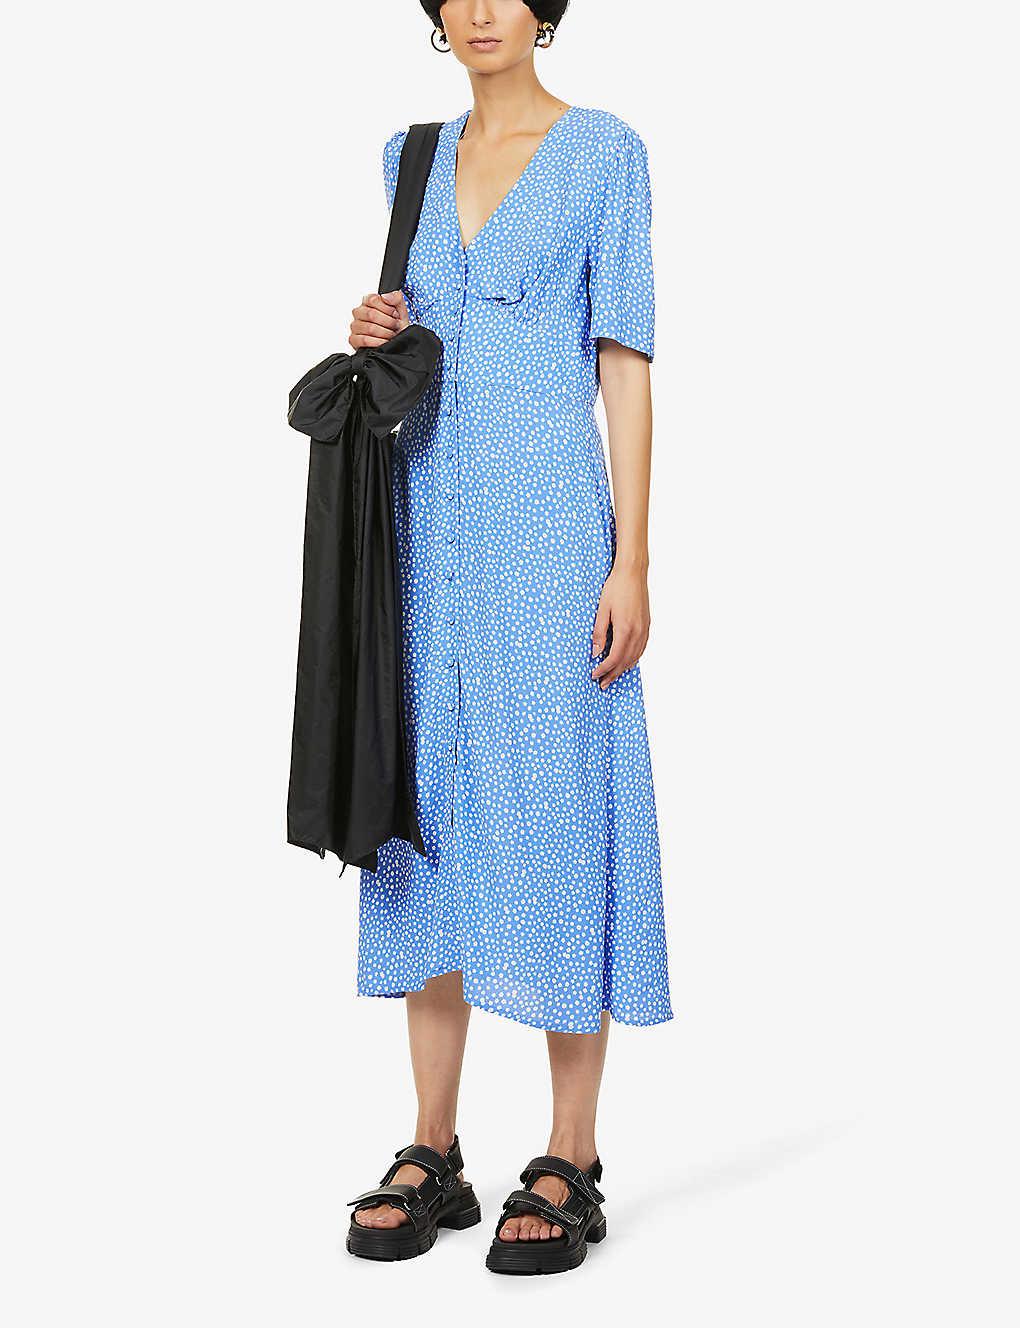 NOBODY'S CHILD Alexa floral-print woven midi dress